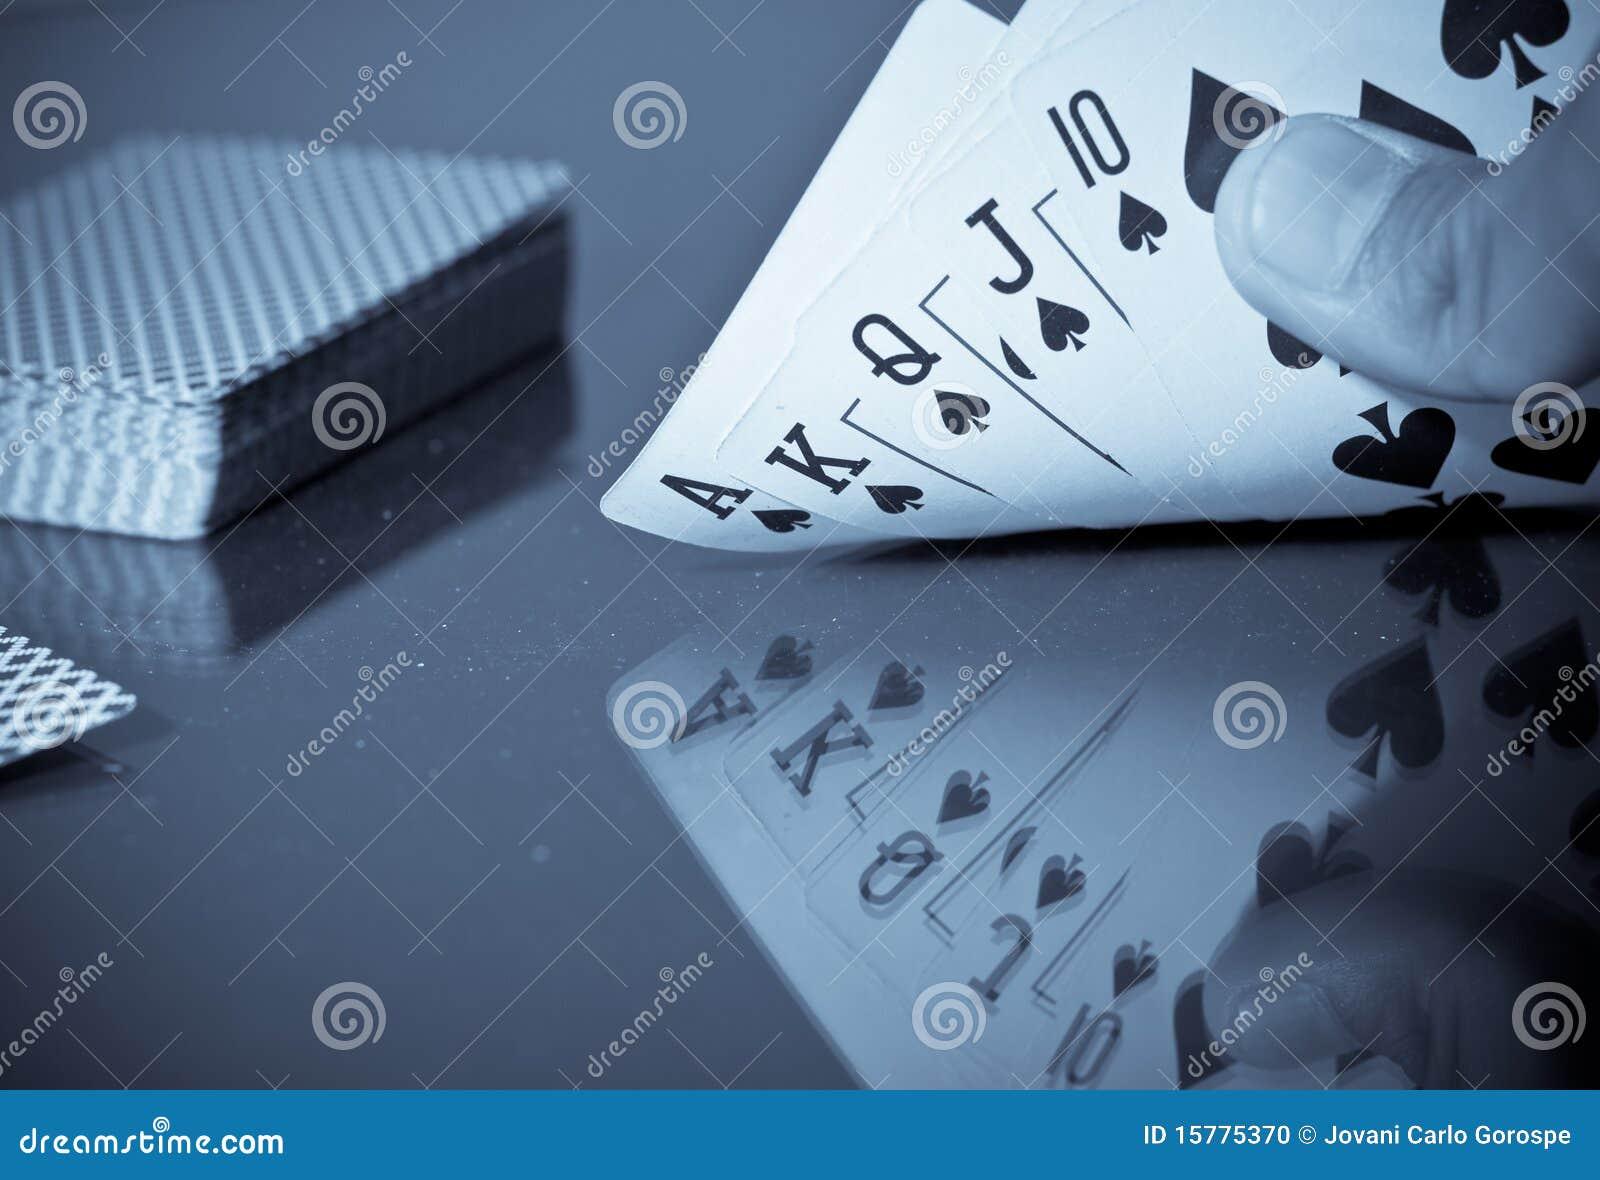 royal vegas online casino download casino holidays